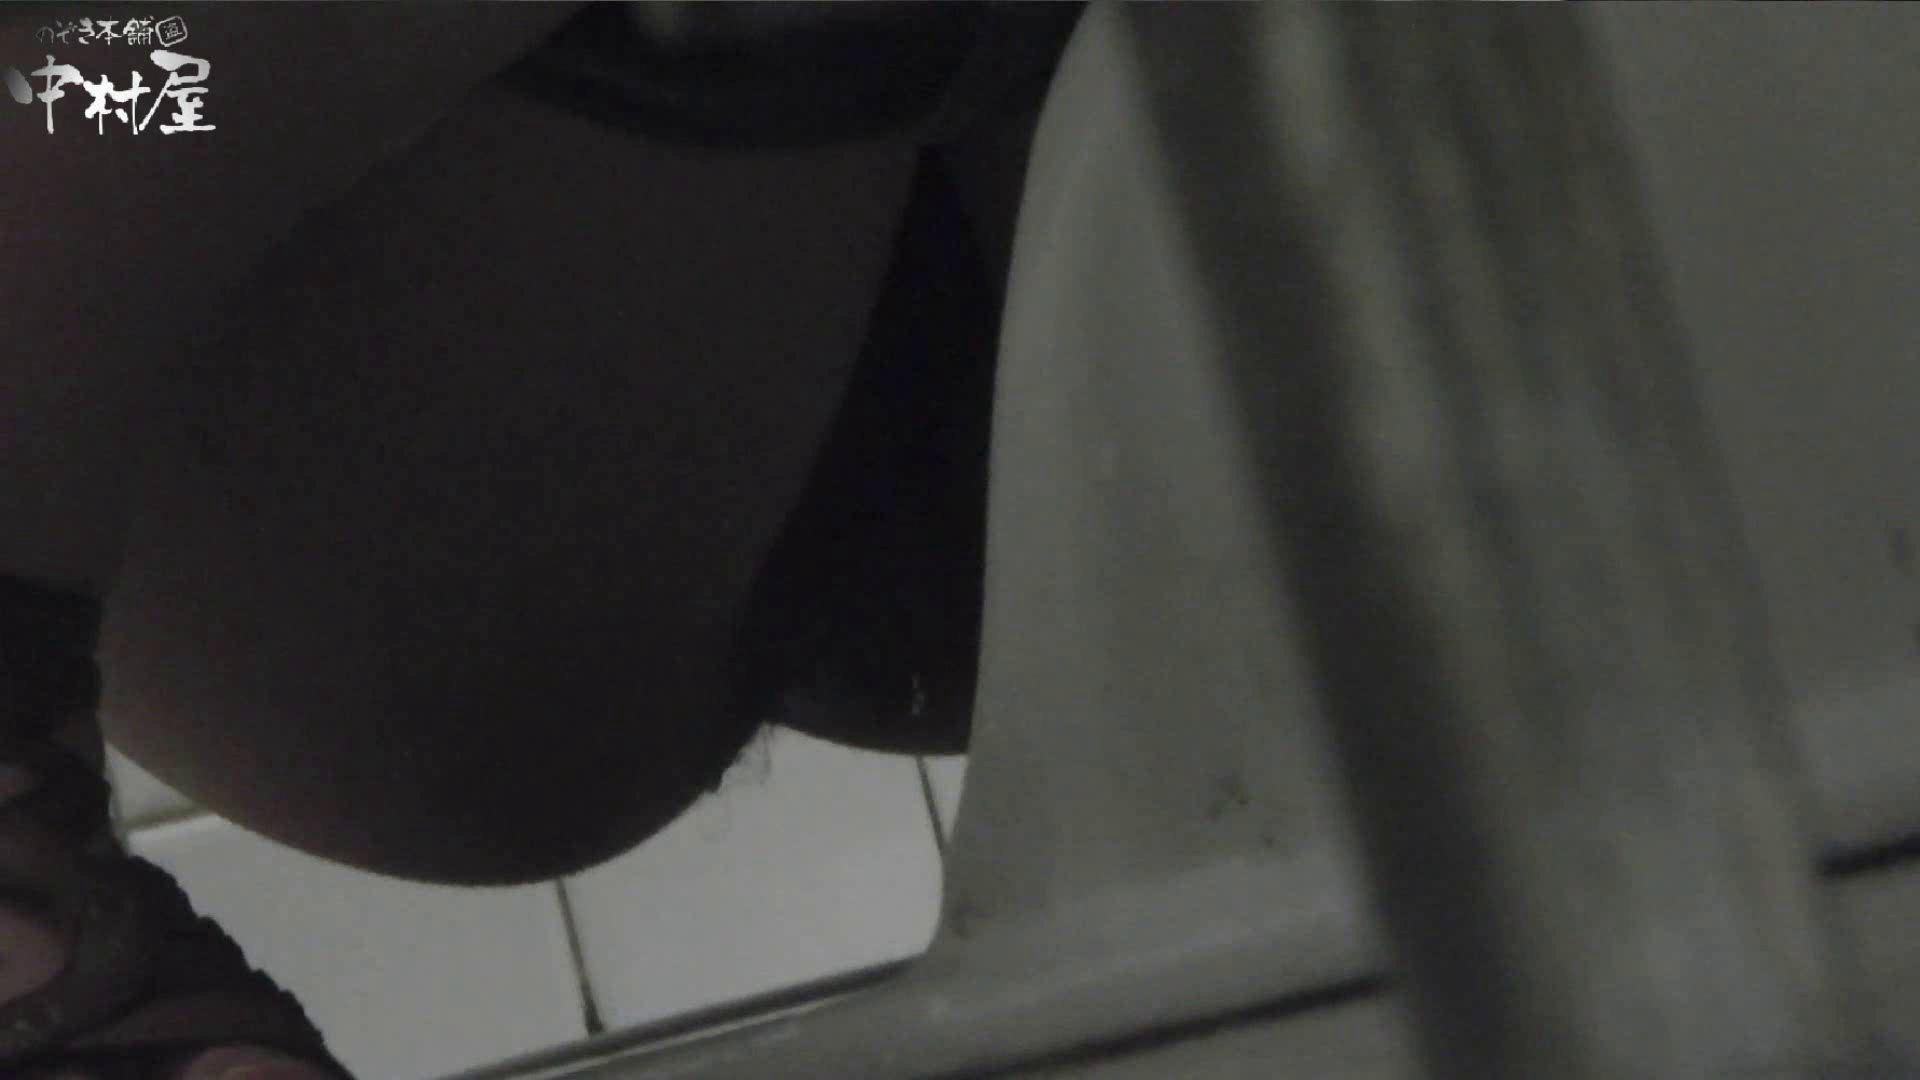 vol.42 命がけ潜伏洗面所! カカト上げながら・硬度強(太)・180g プライベート 盗撮アダルト動画キャプチャ 102画像 47